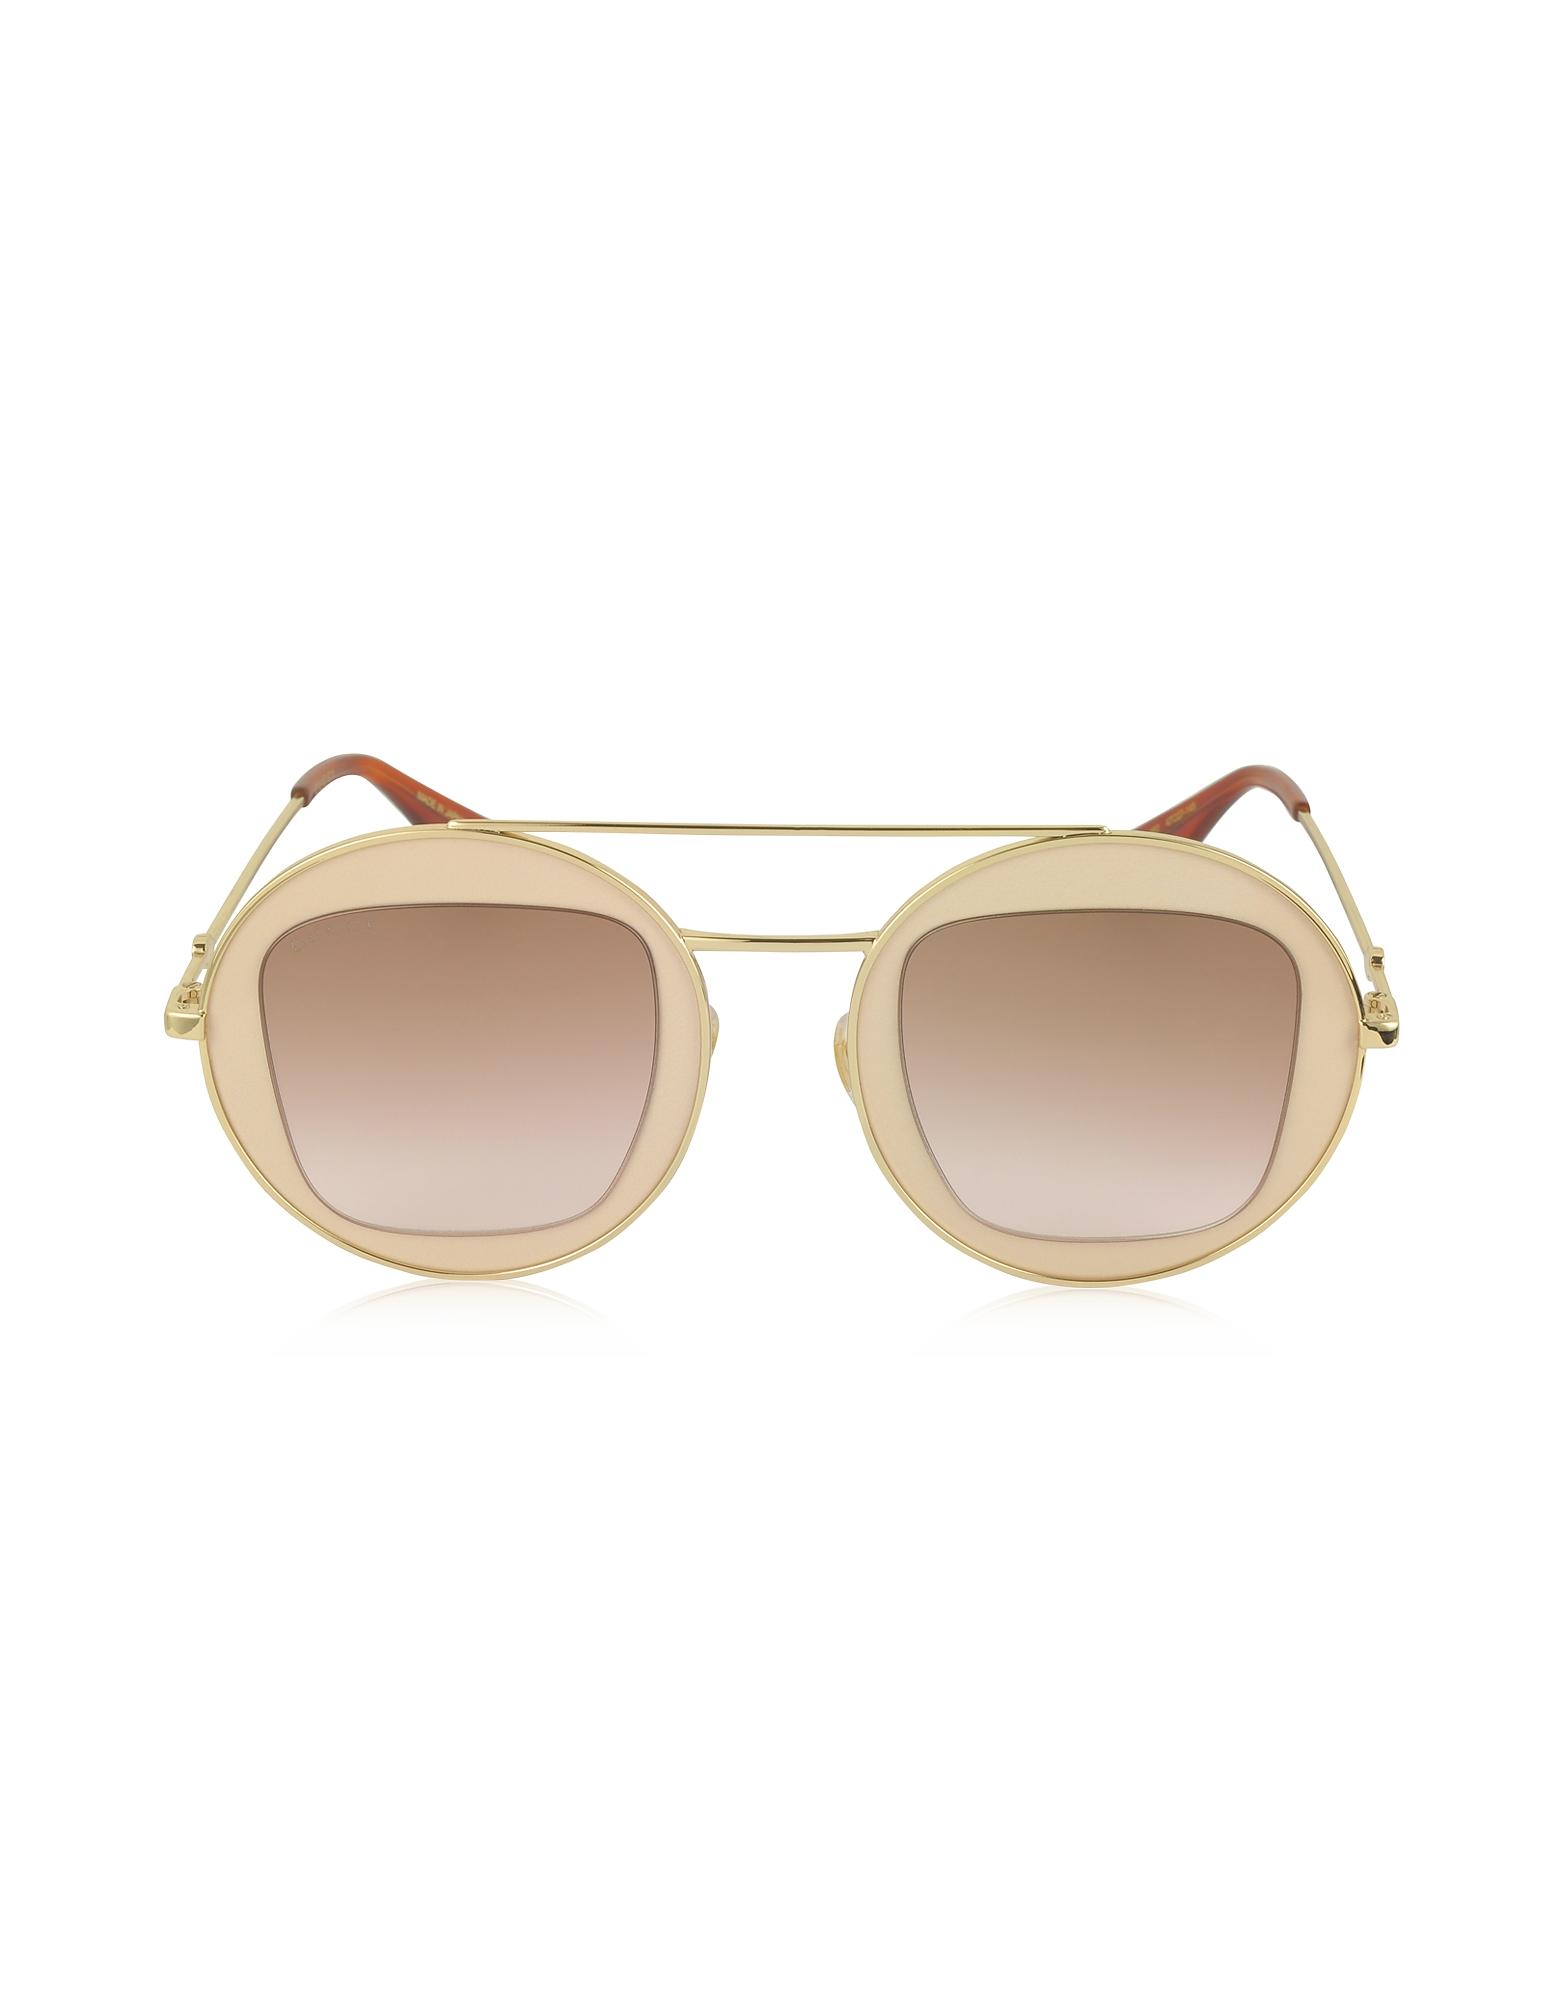 Gucci Sunglasses, GG0105S Metal Round Aviator Women's Sunglasses